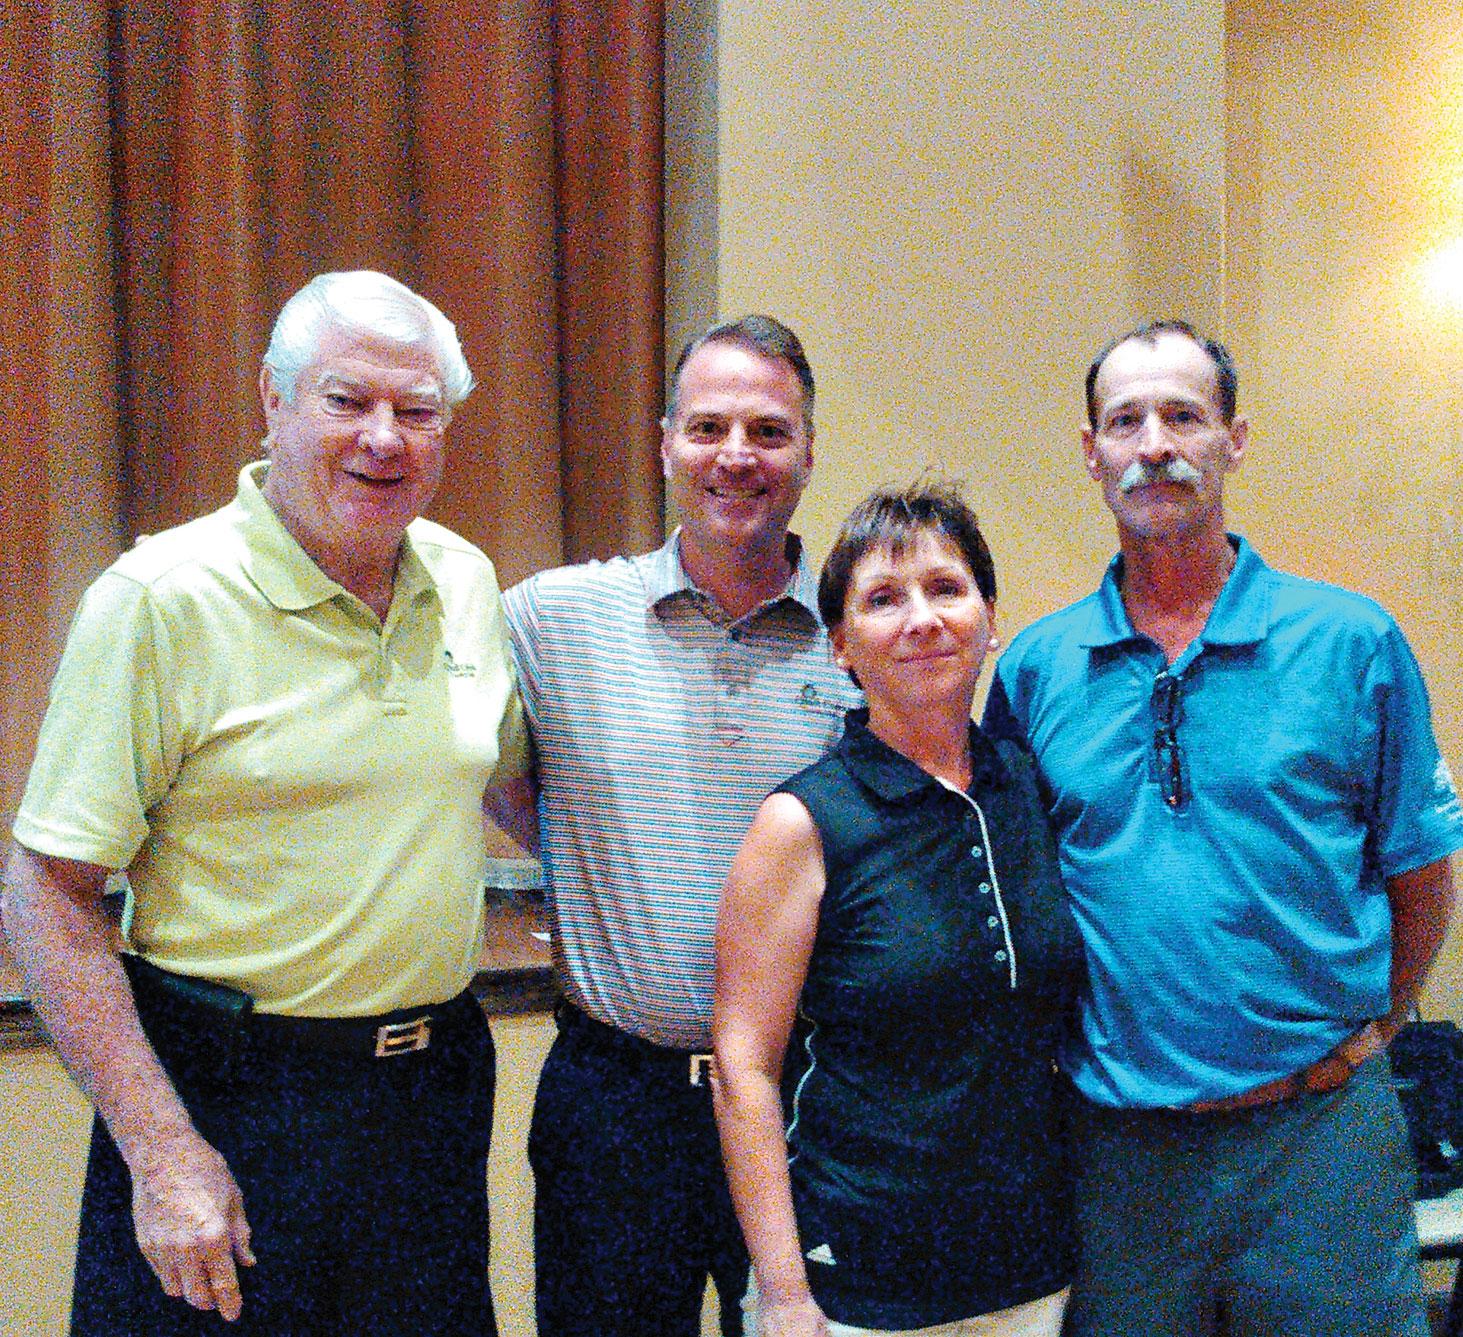 Left to right: Dick Kohlman, president of QCCGA, Joel Jaress, club professional QC, Christie Greiter club champion and Dave Chambers club champion